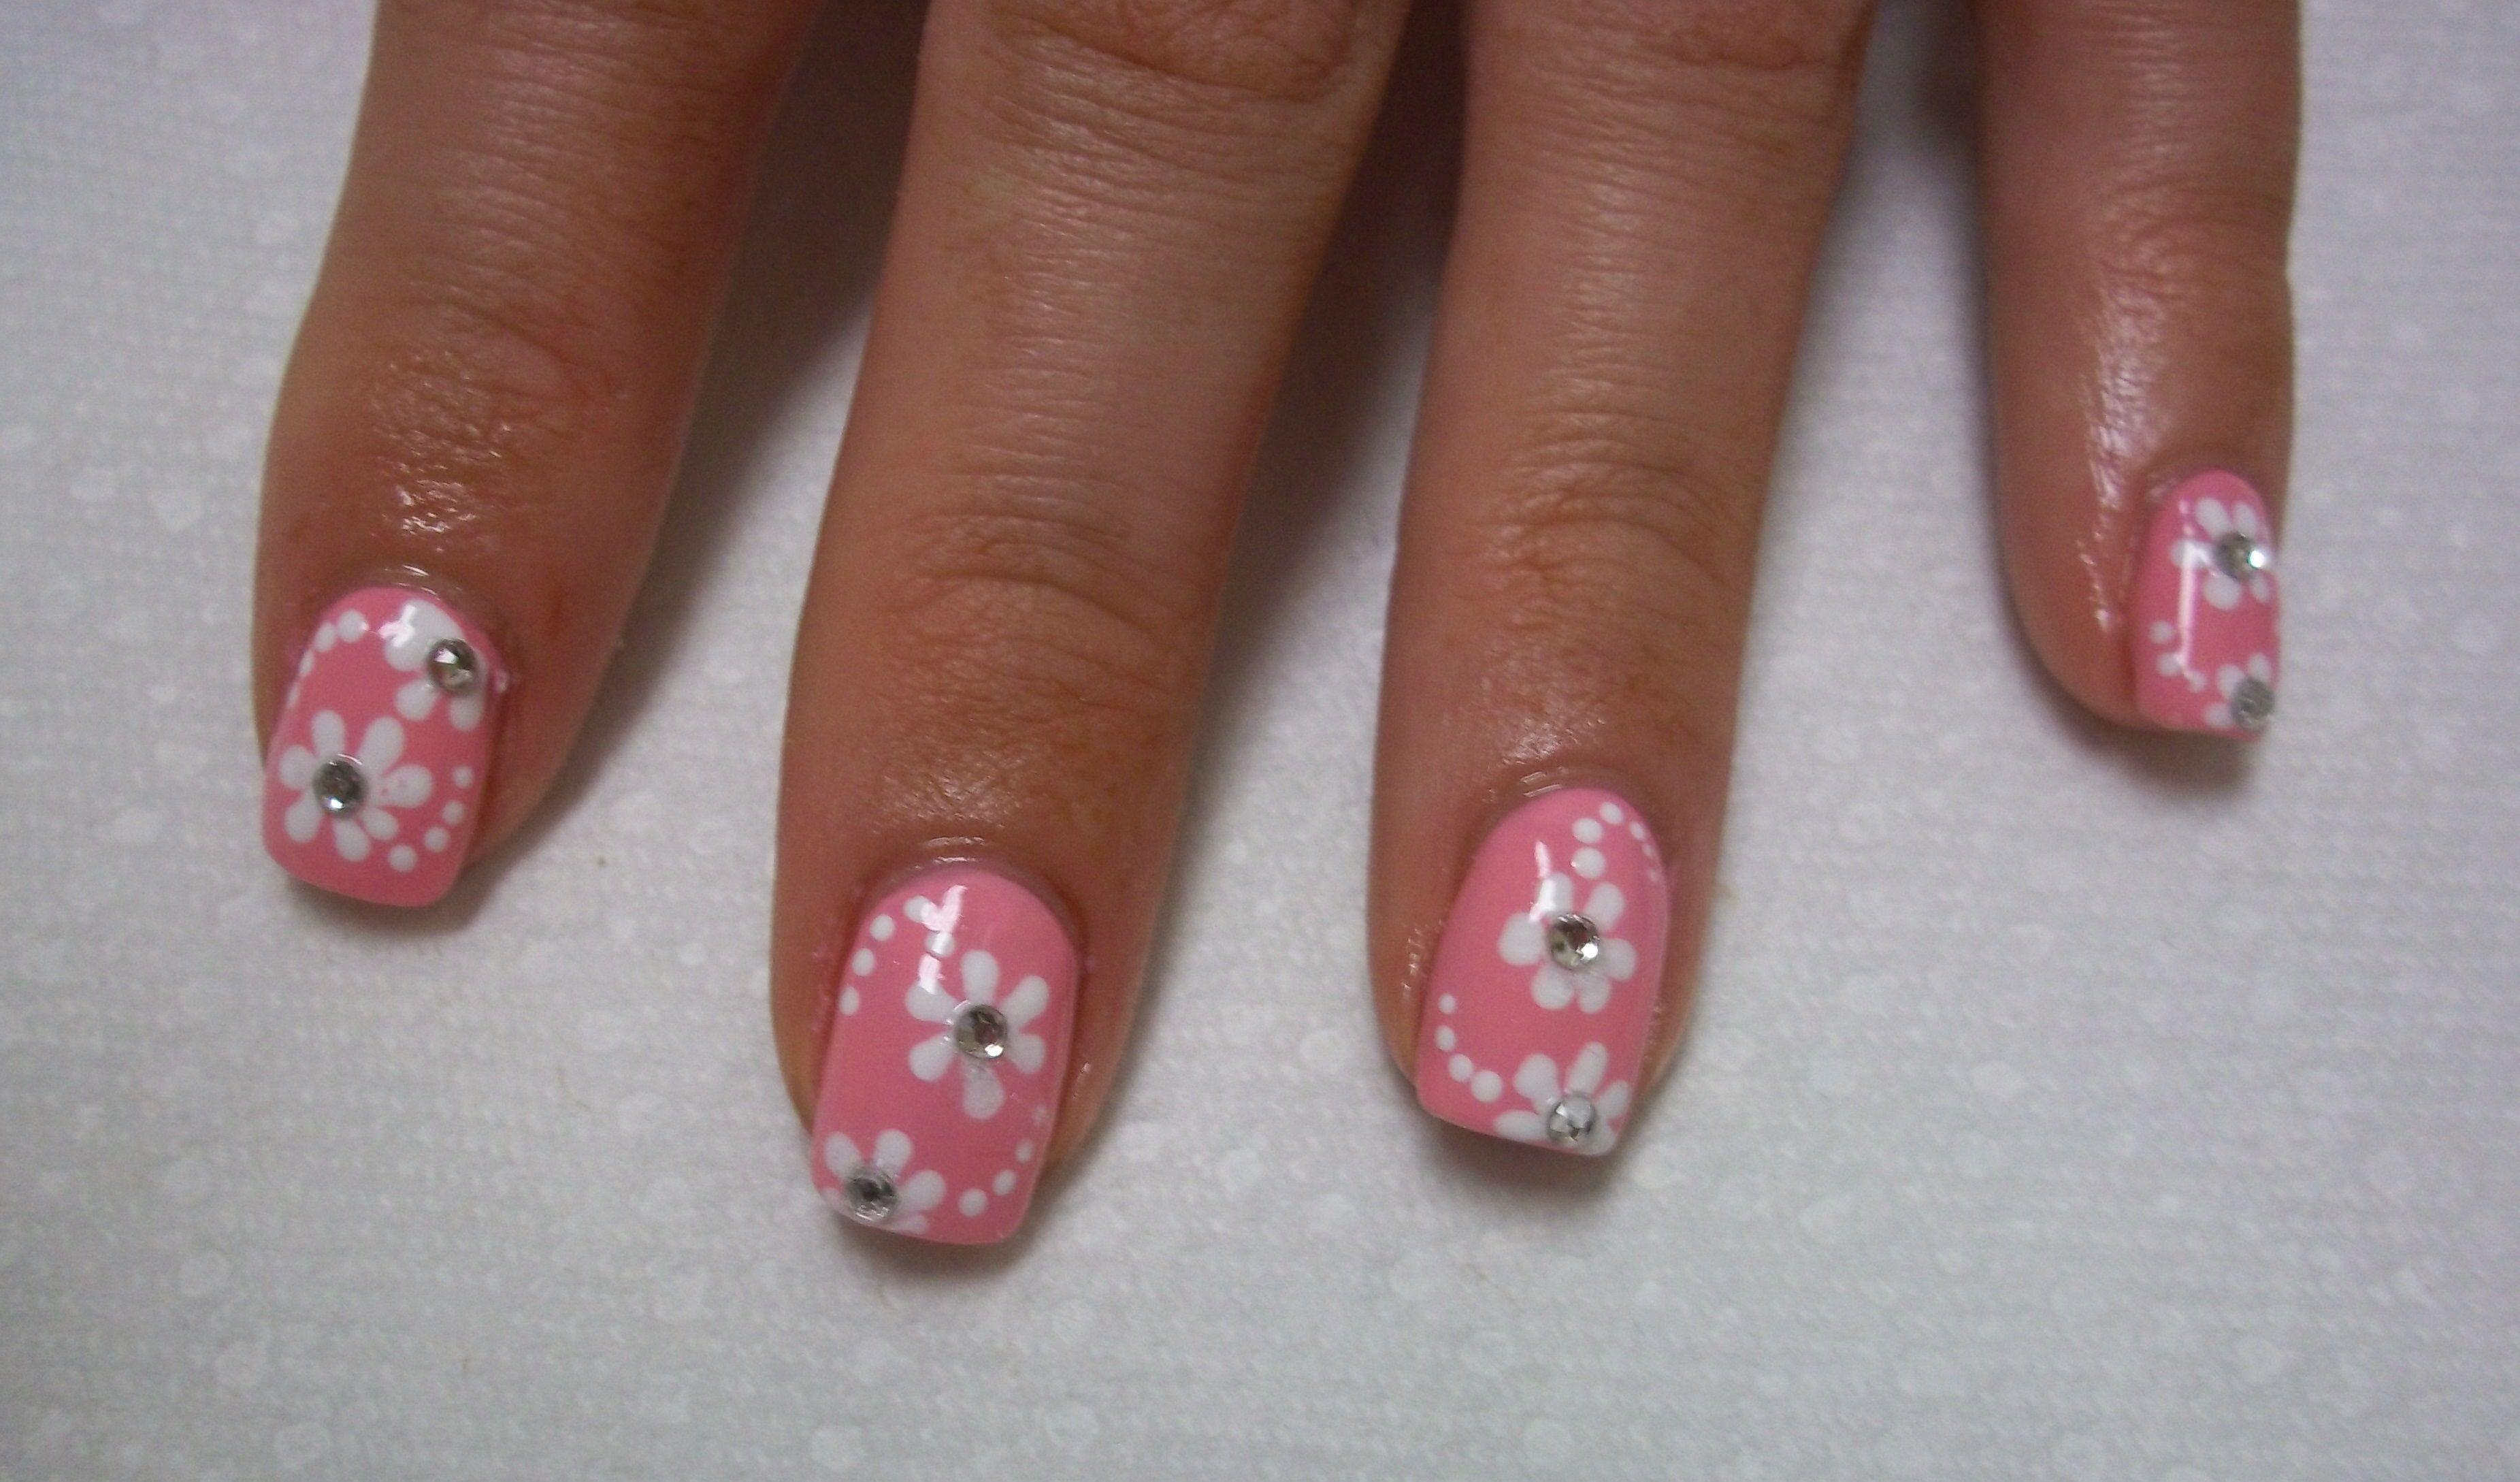 Summer Nail Art 2013 Barb Nott Nail Tech Sarasota Fl 941 371 4999 Nail Art Summer Nails Nail Art Summer